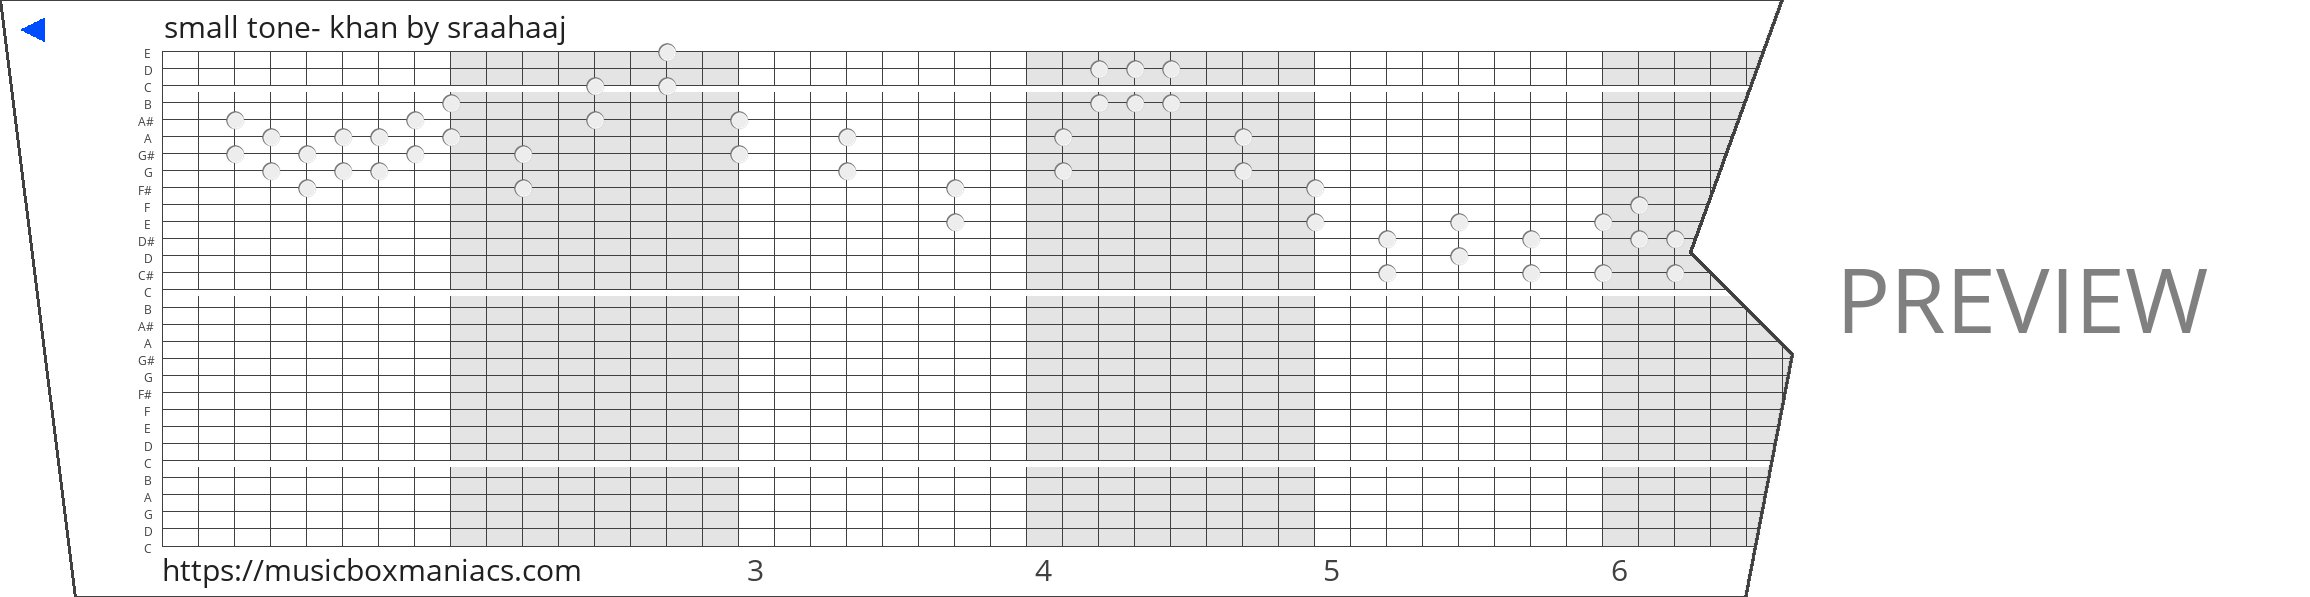 small tone- khan 30 note music box paper strip